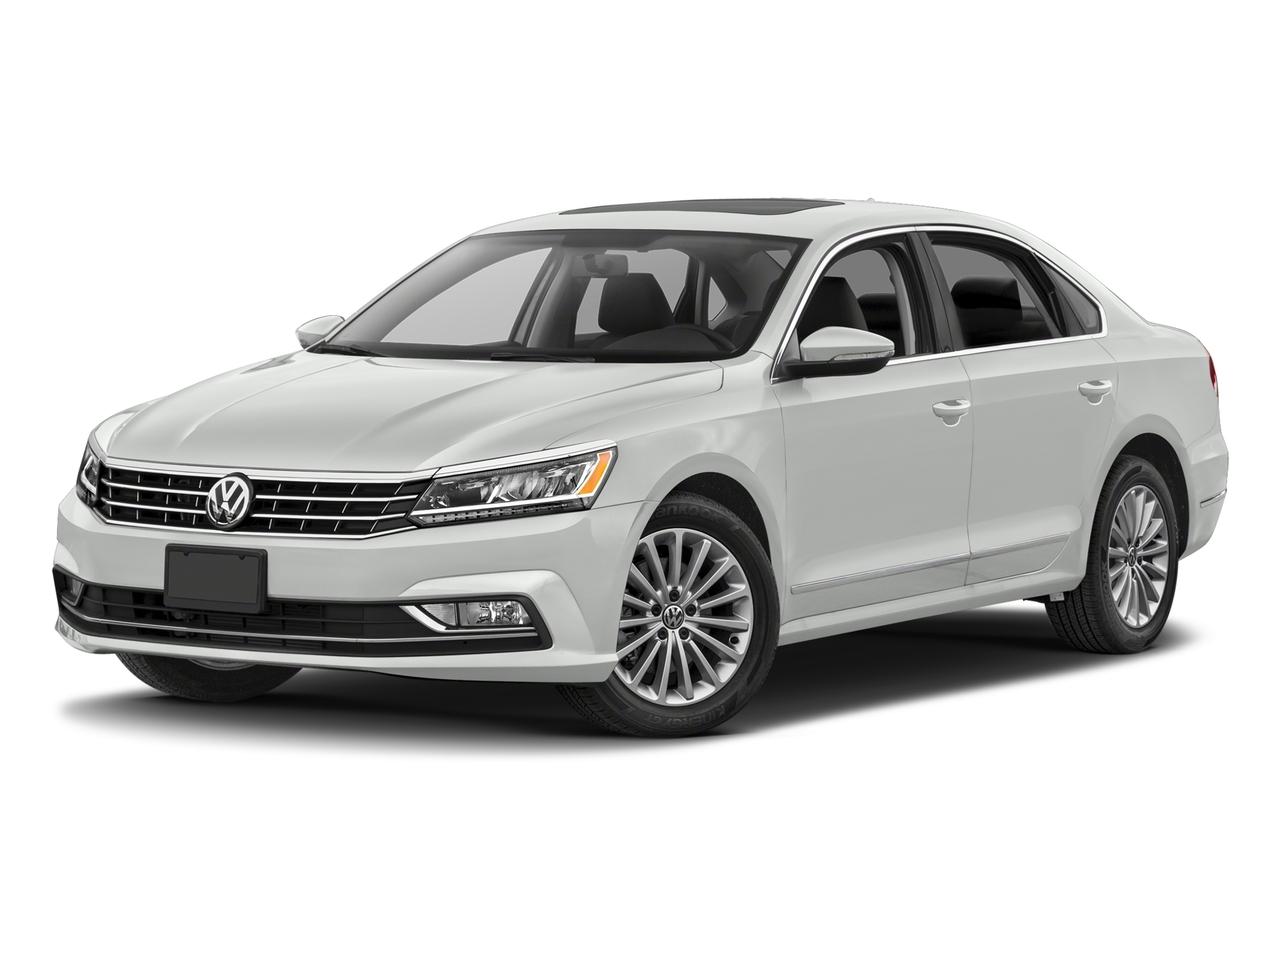 2017 Volkswagen Passat 1.8T SE Sedan Merriam KS